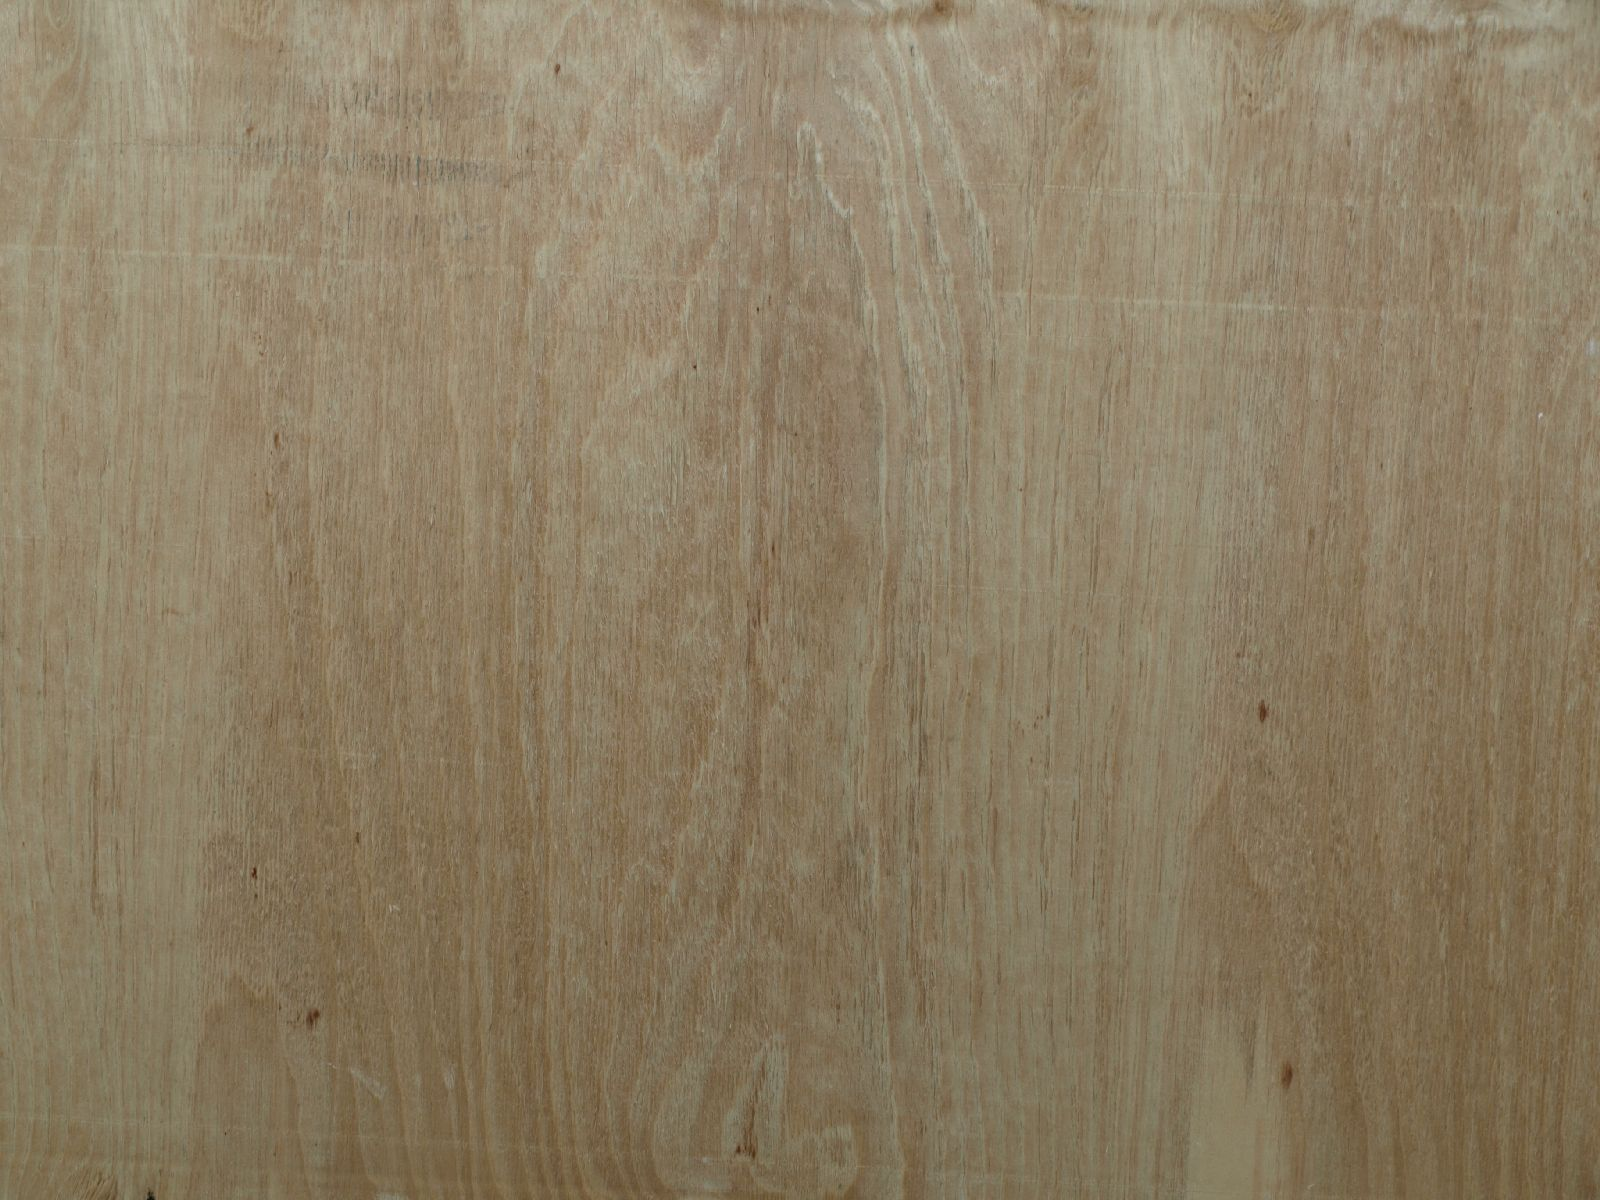 Wood_Texture_A_P4080227